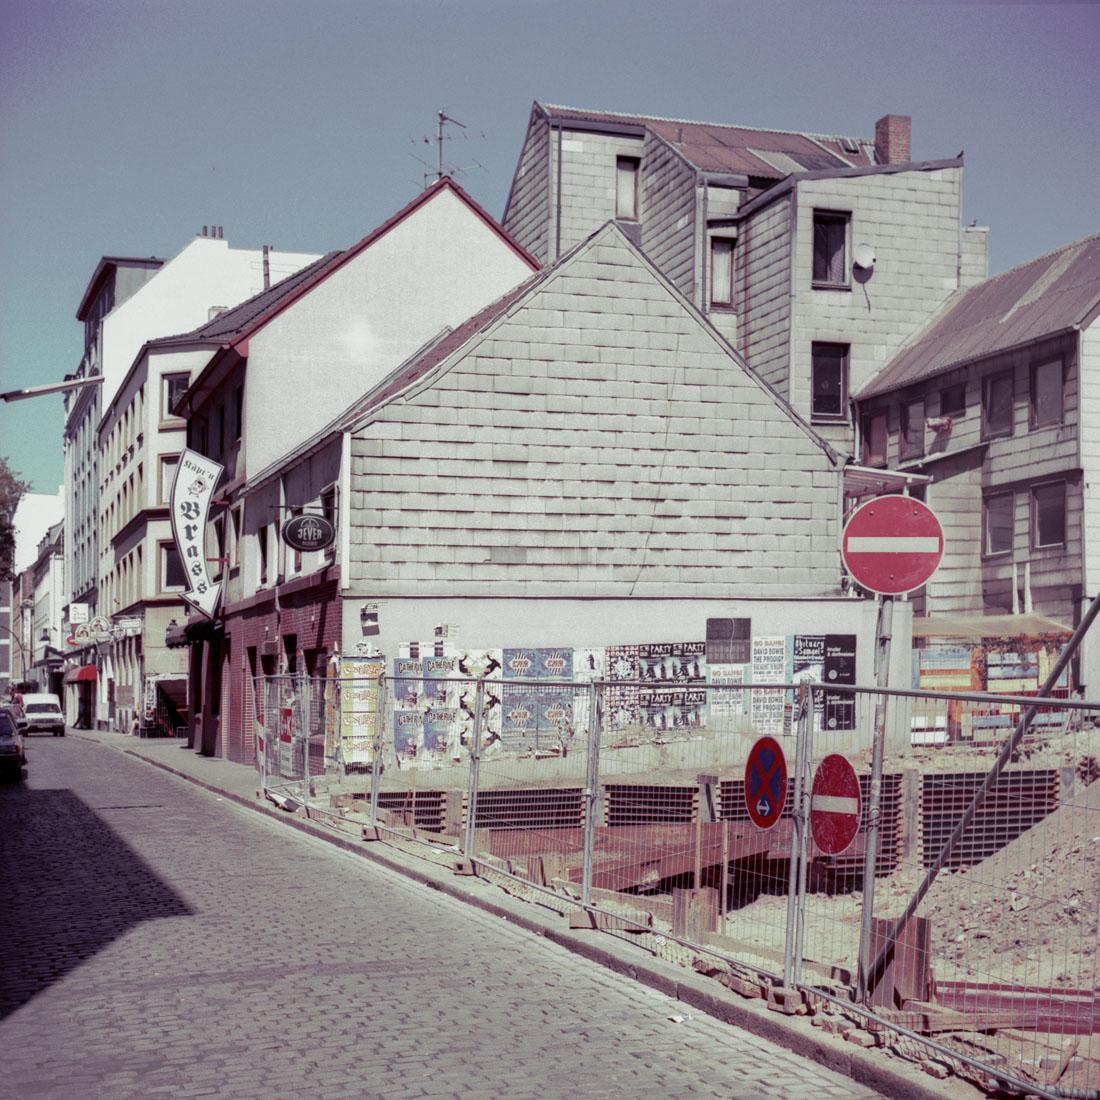 Gerhardstrasse, Käpt_n Brass, 1997